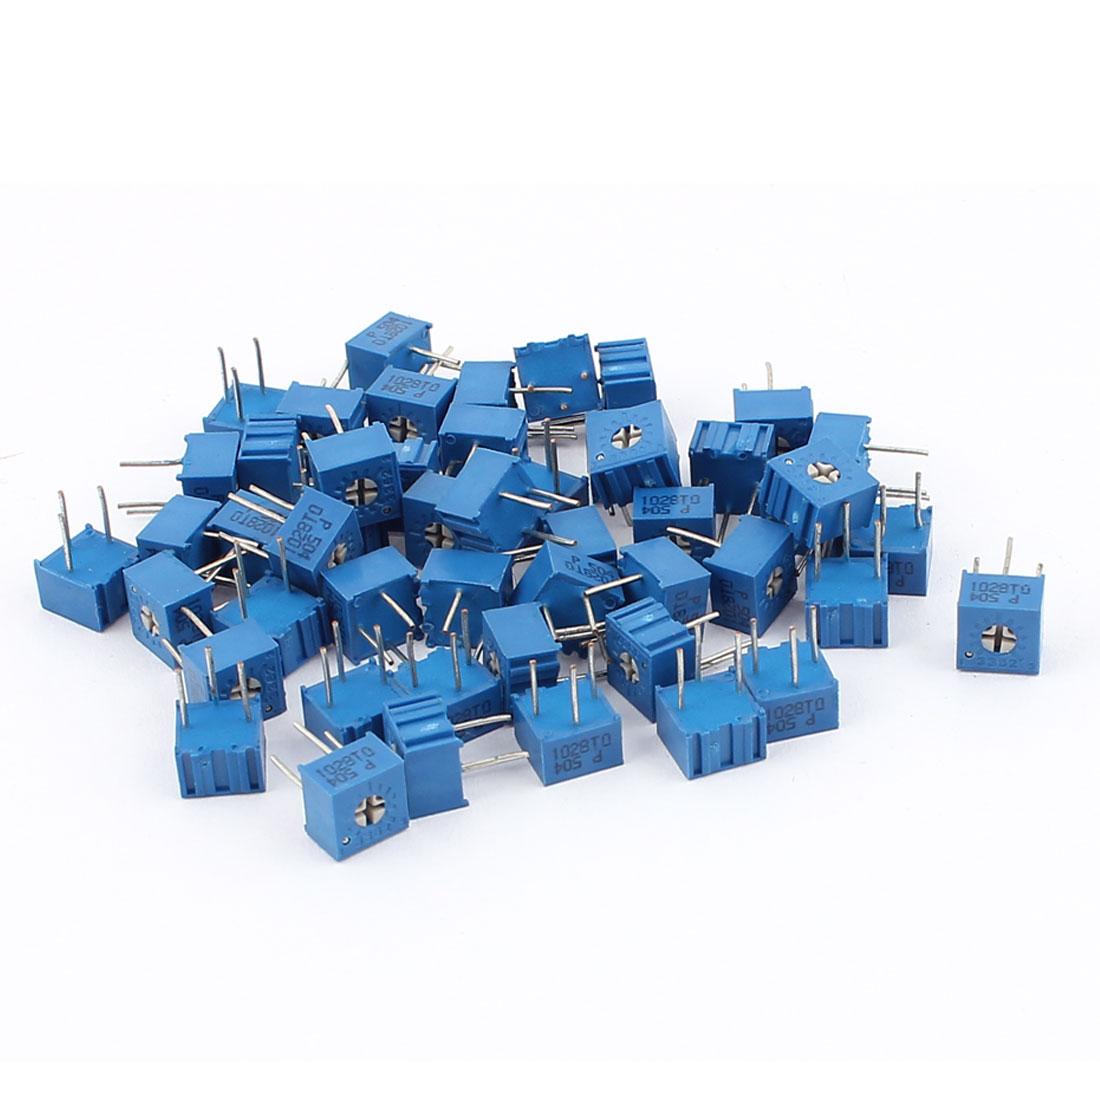 50Pcs Adjustable Potentiometer Trimmer Variable Resistor 3362P-504 500K Ohm